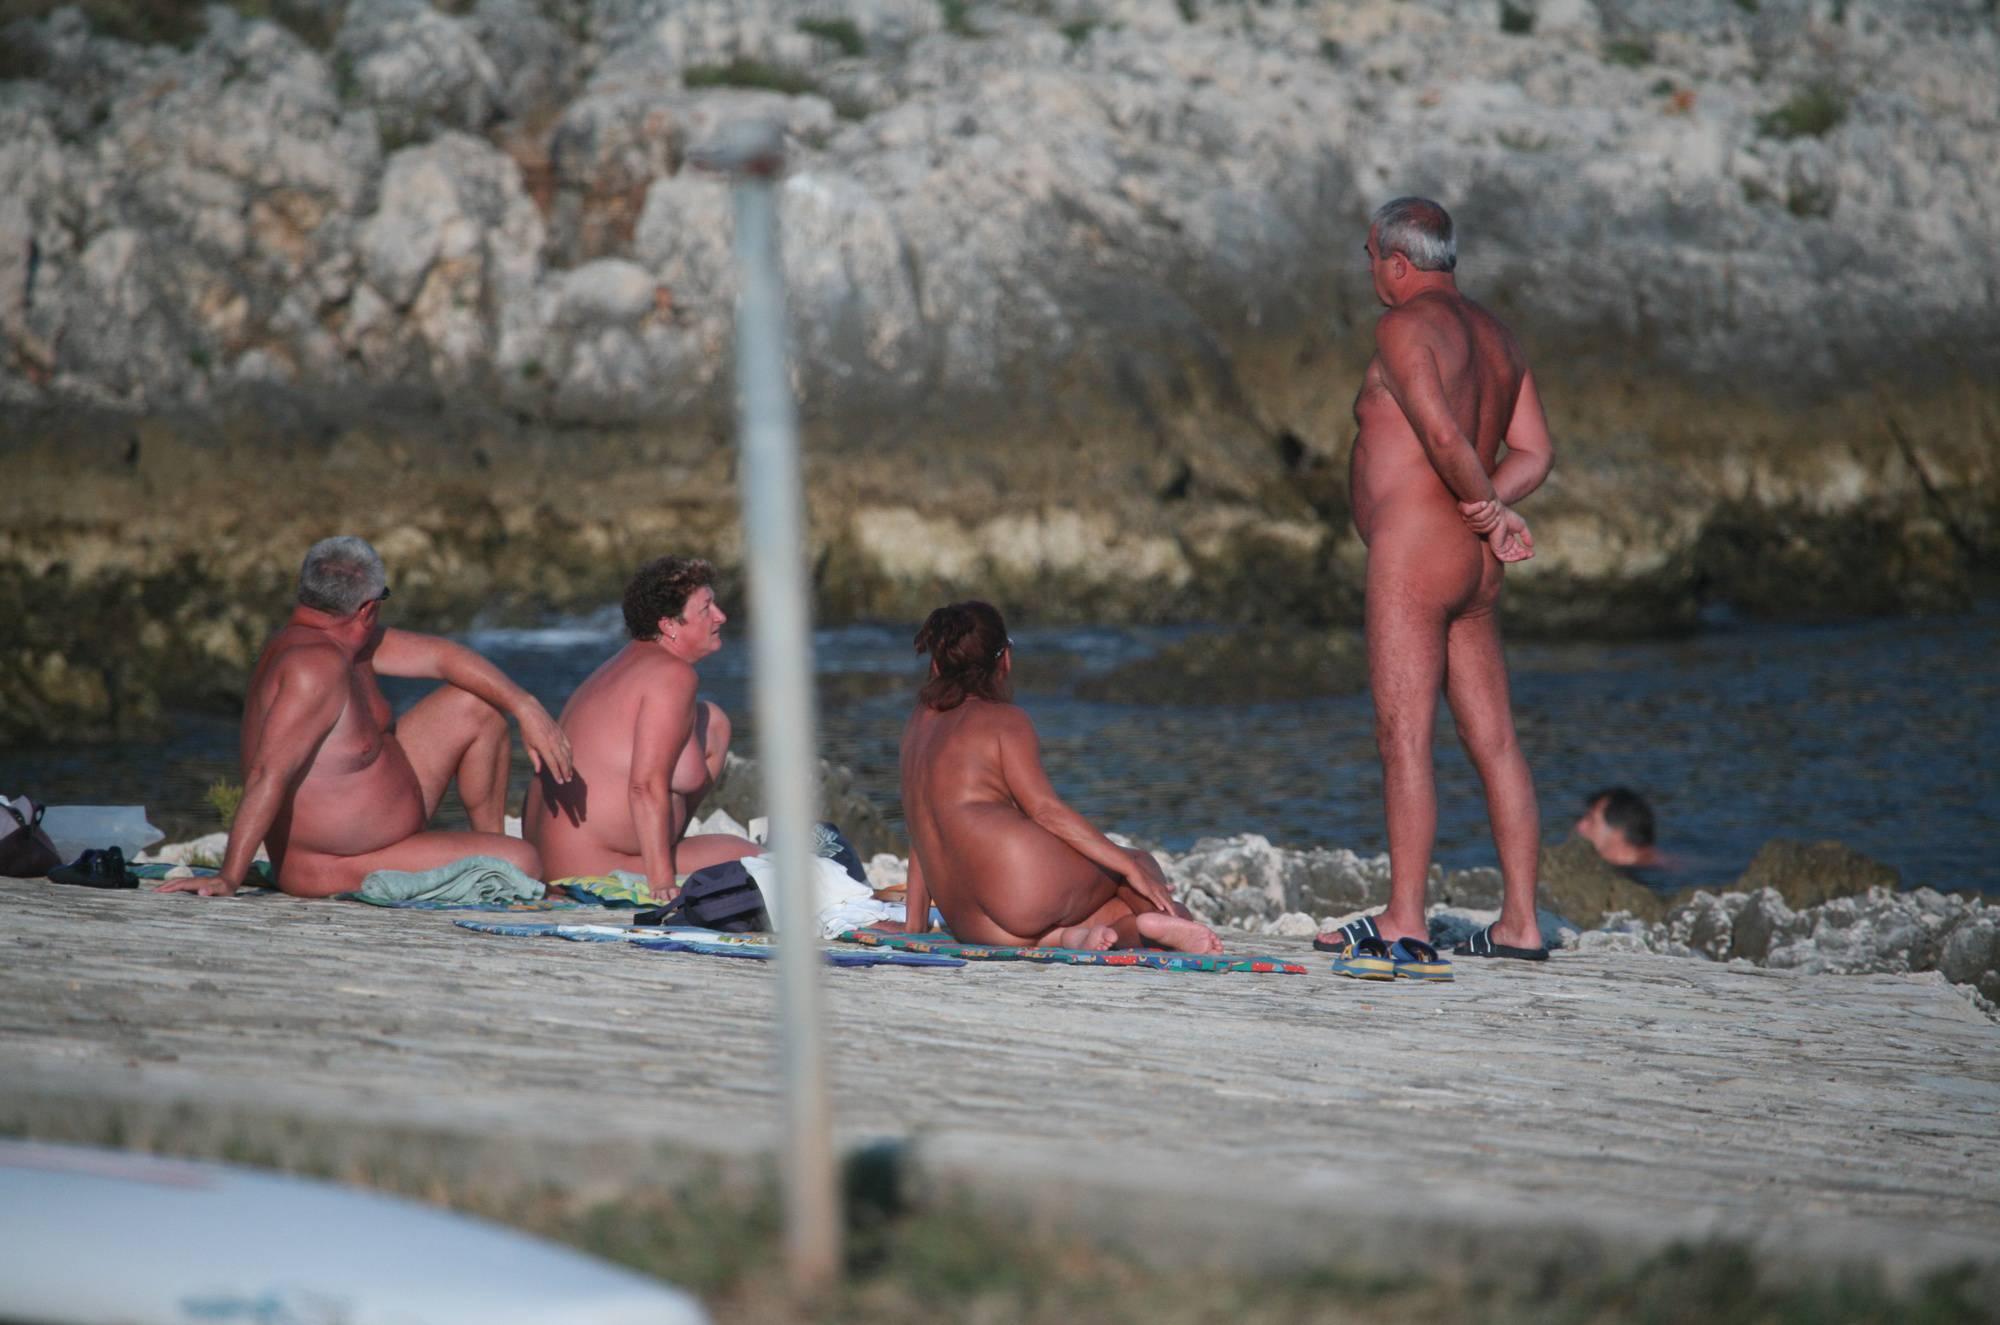 Purenudism Gallery-Nude Beach Assortment - 1